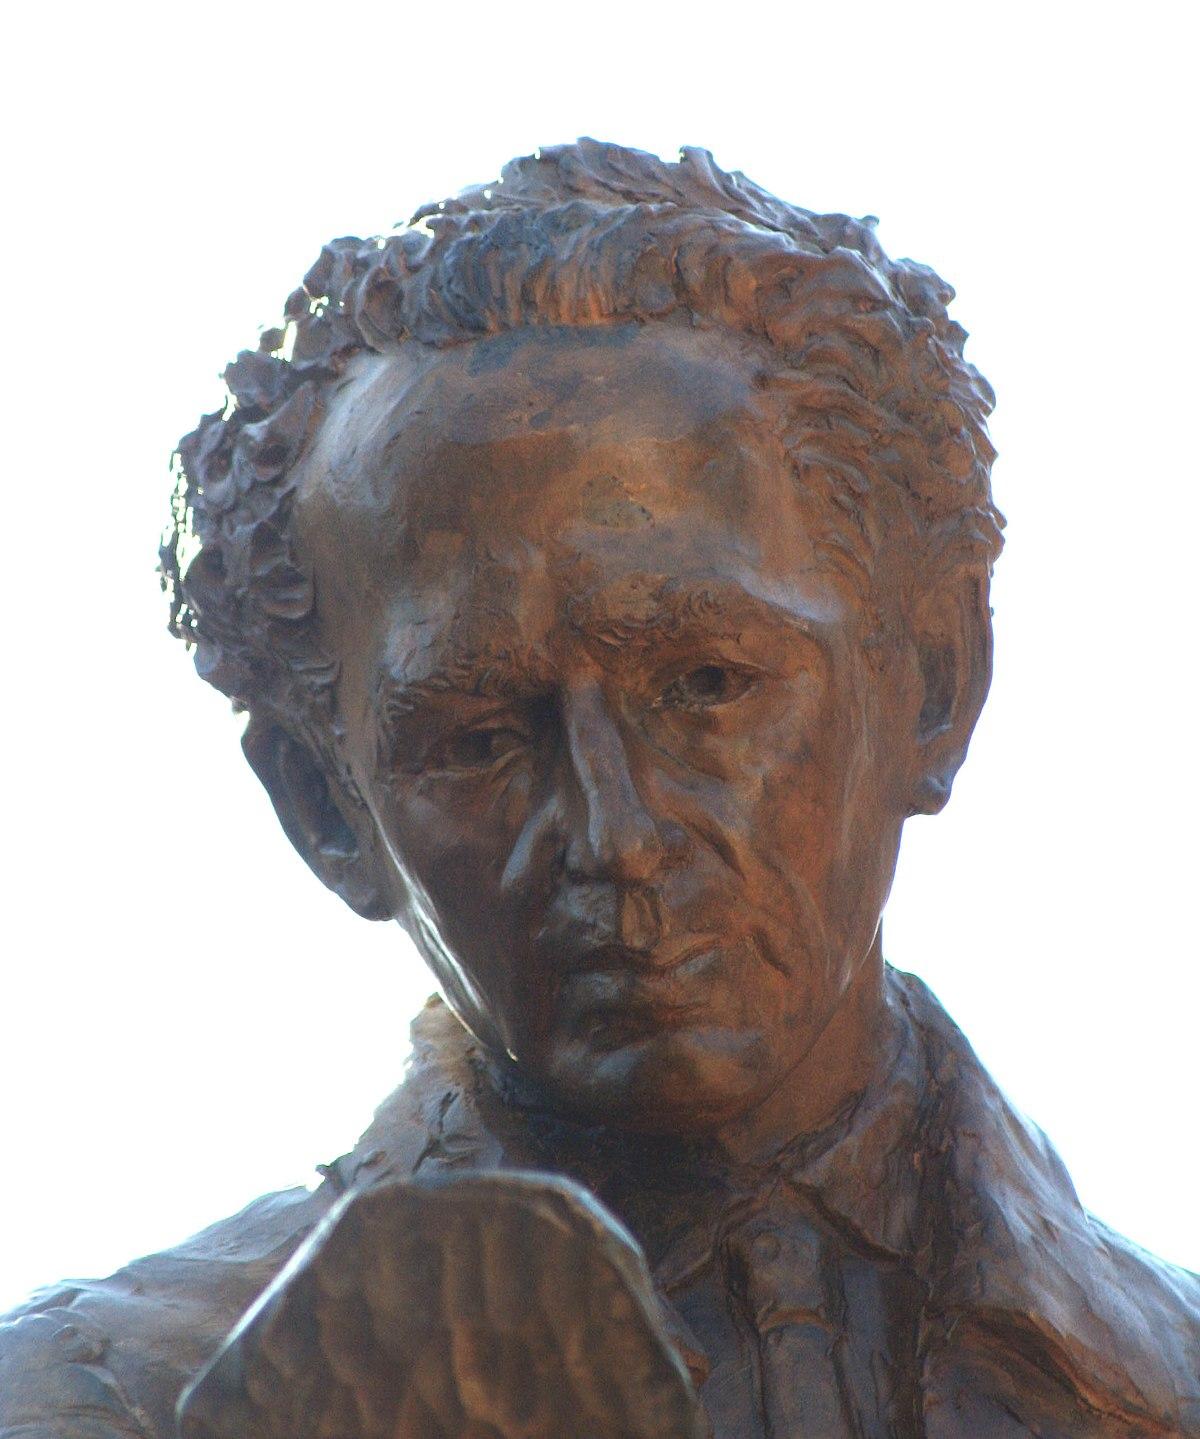 Antonio León Ortega Wikipédia